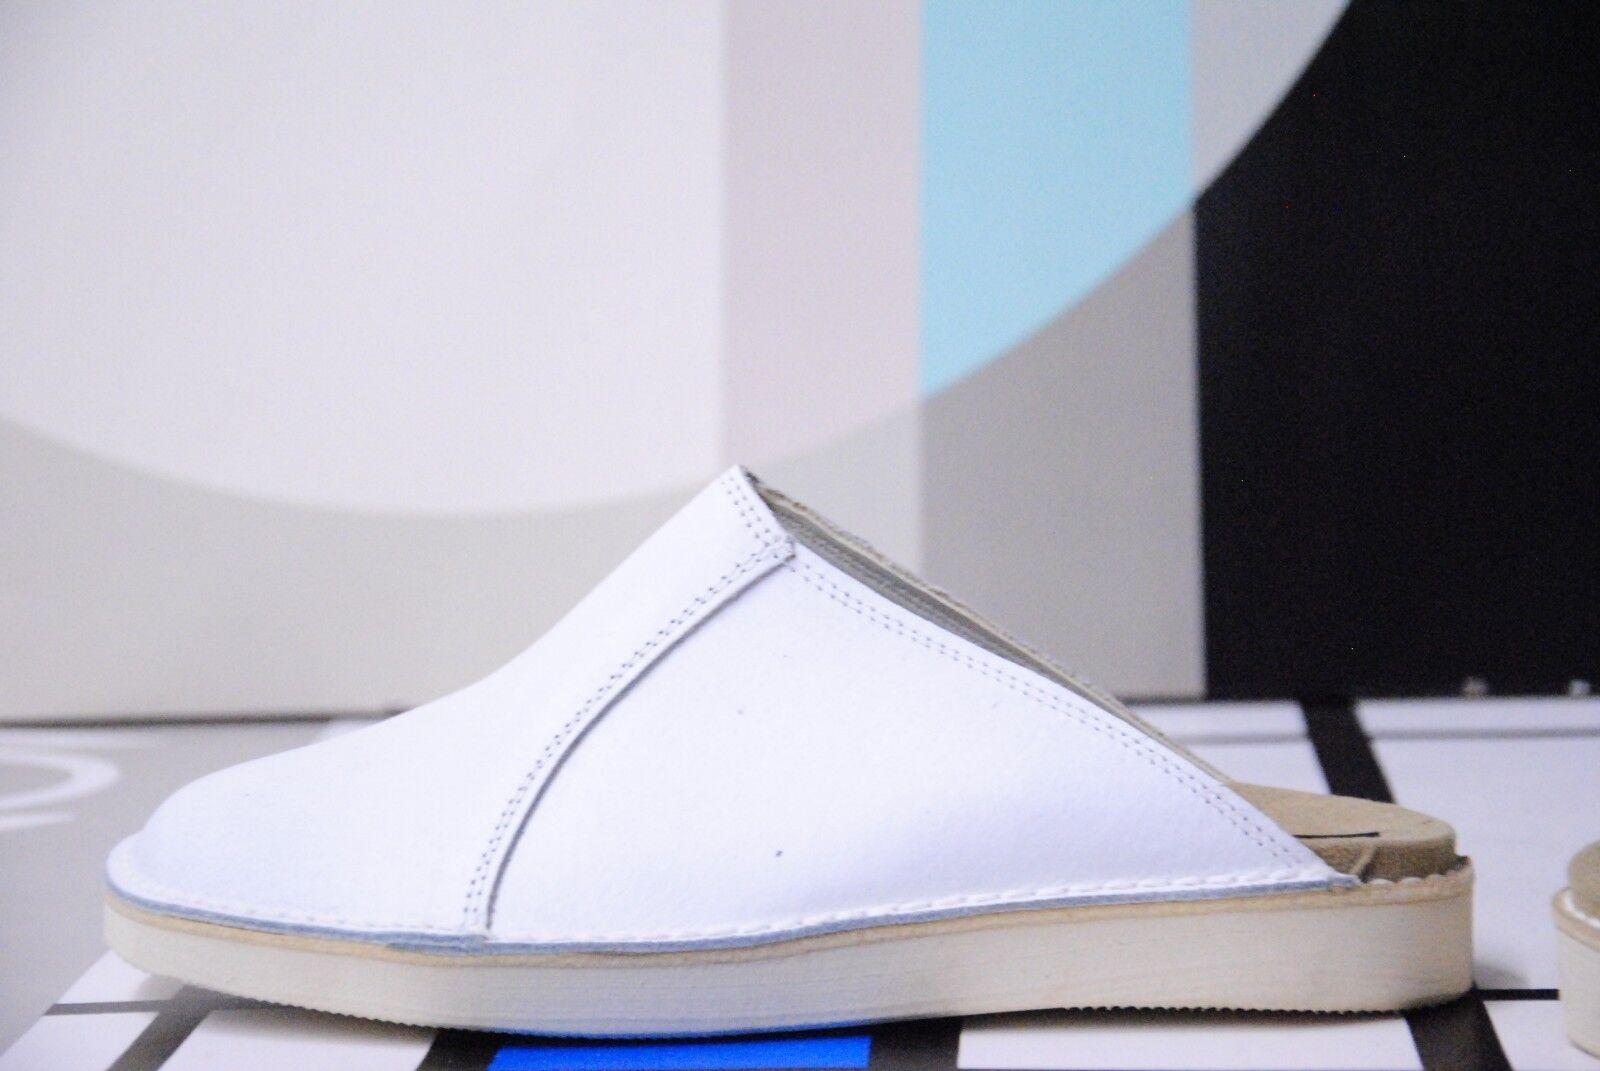 NOS Lejeune weiße Pantolette Badeschuhe OP Sandalen Clogs 90s TRUE VINTAGE Gr 42